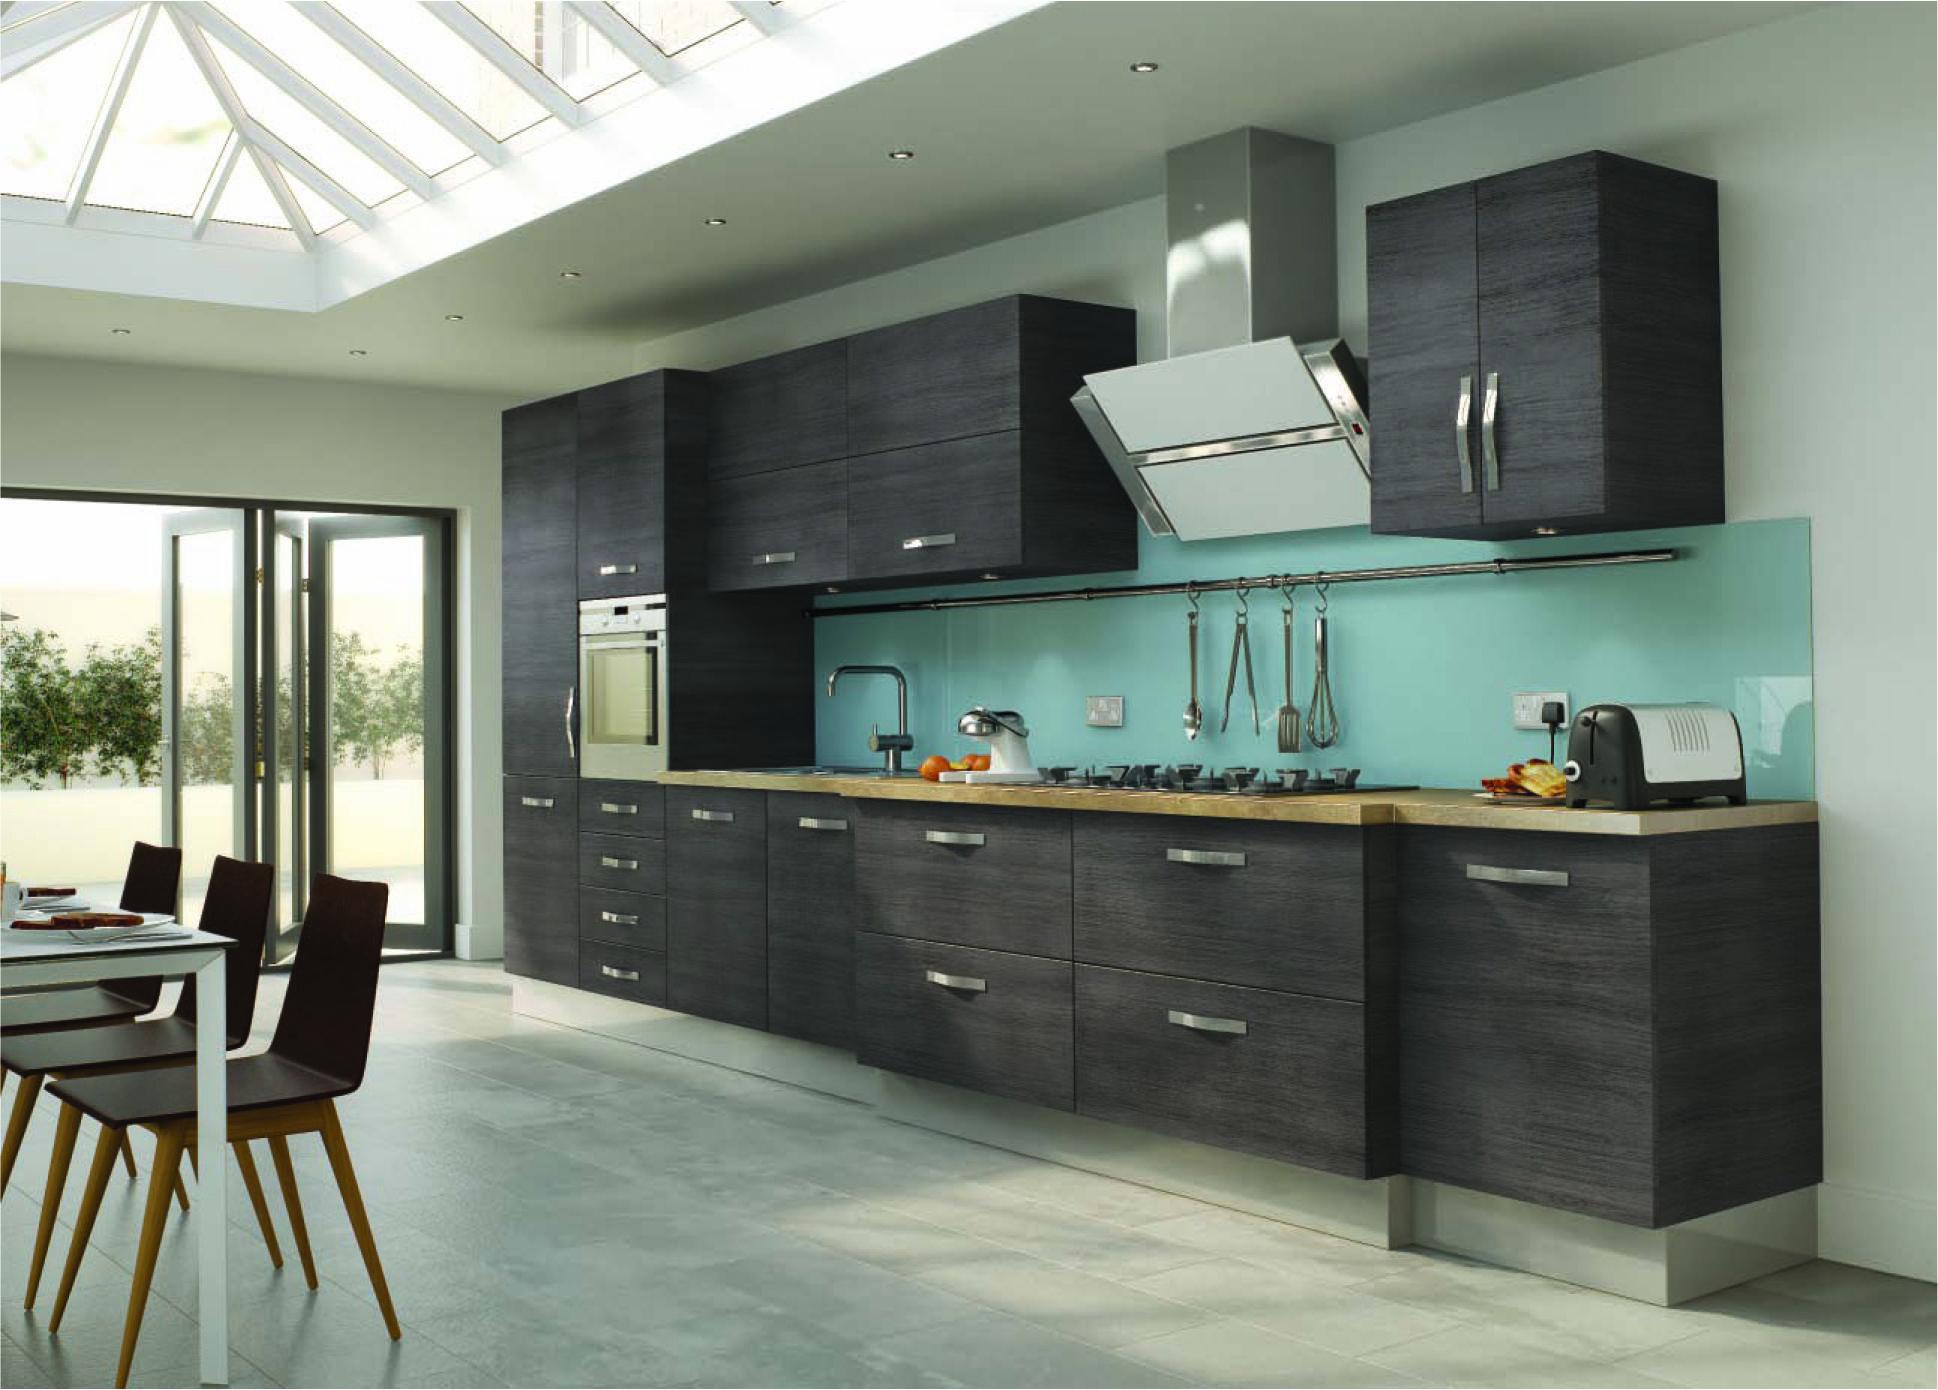 Modern Large Kitchen Designs 2013 Hd Wallpaper  My Future Home Amusing Latest Kitchen Designs Uk Review